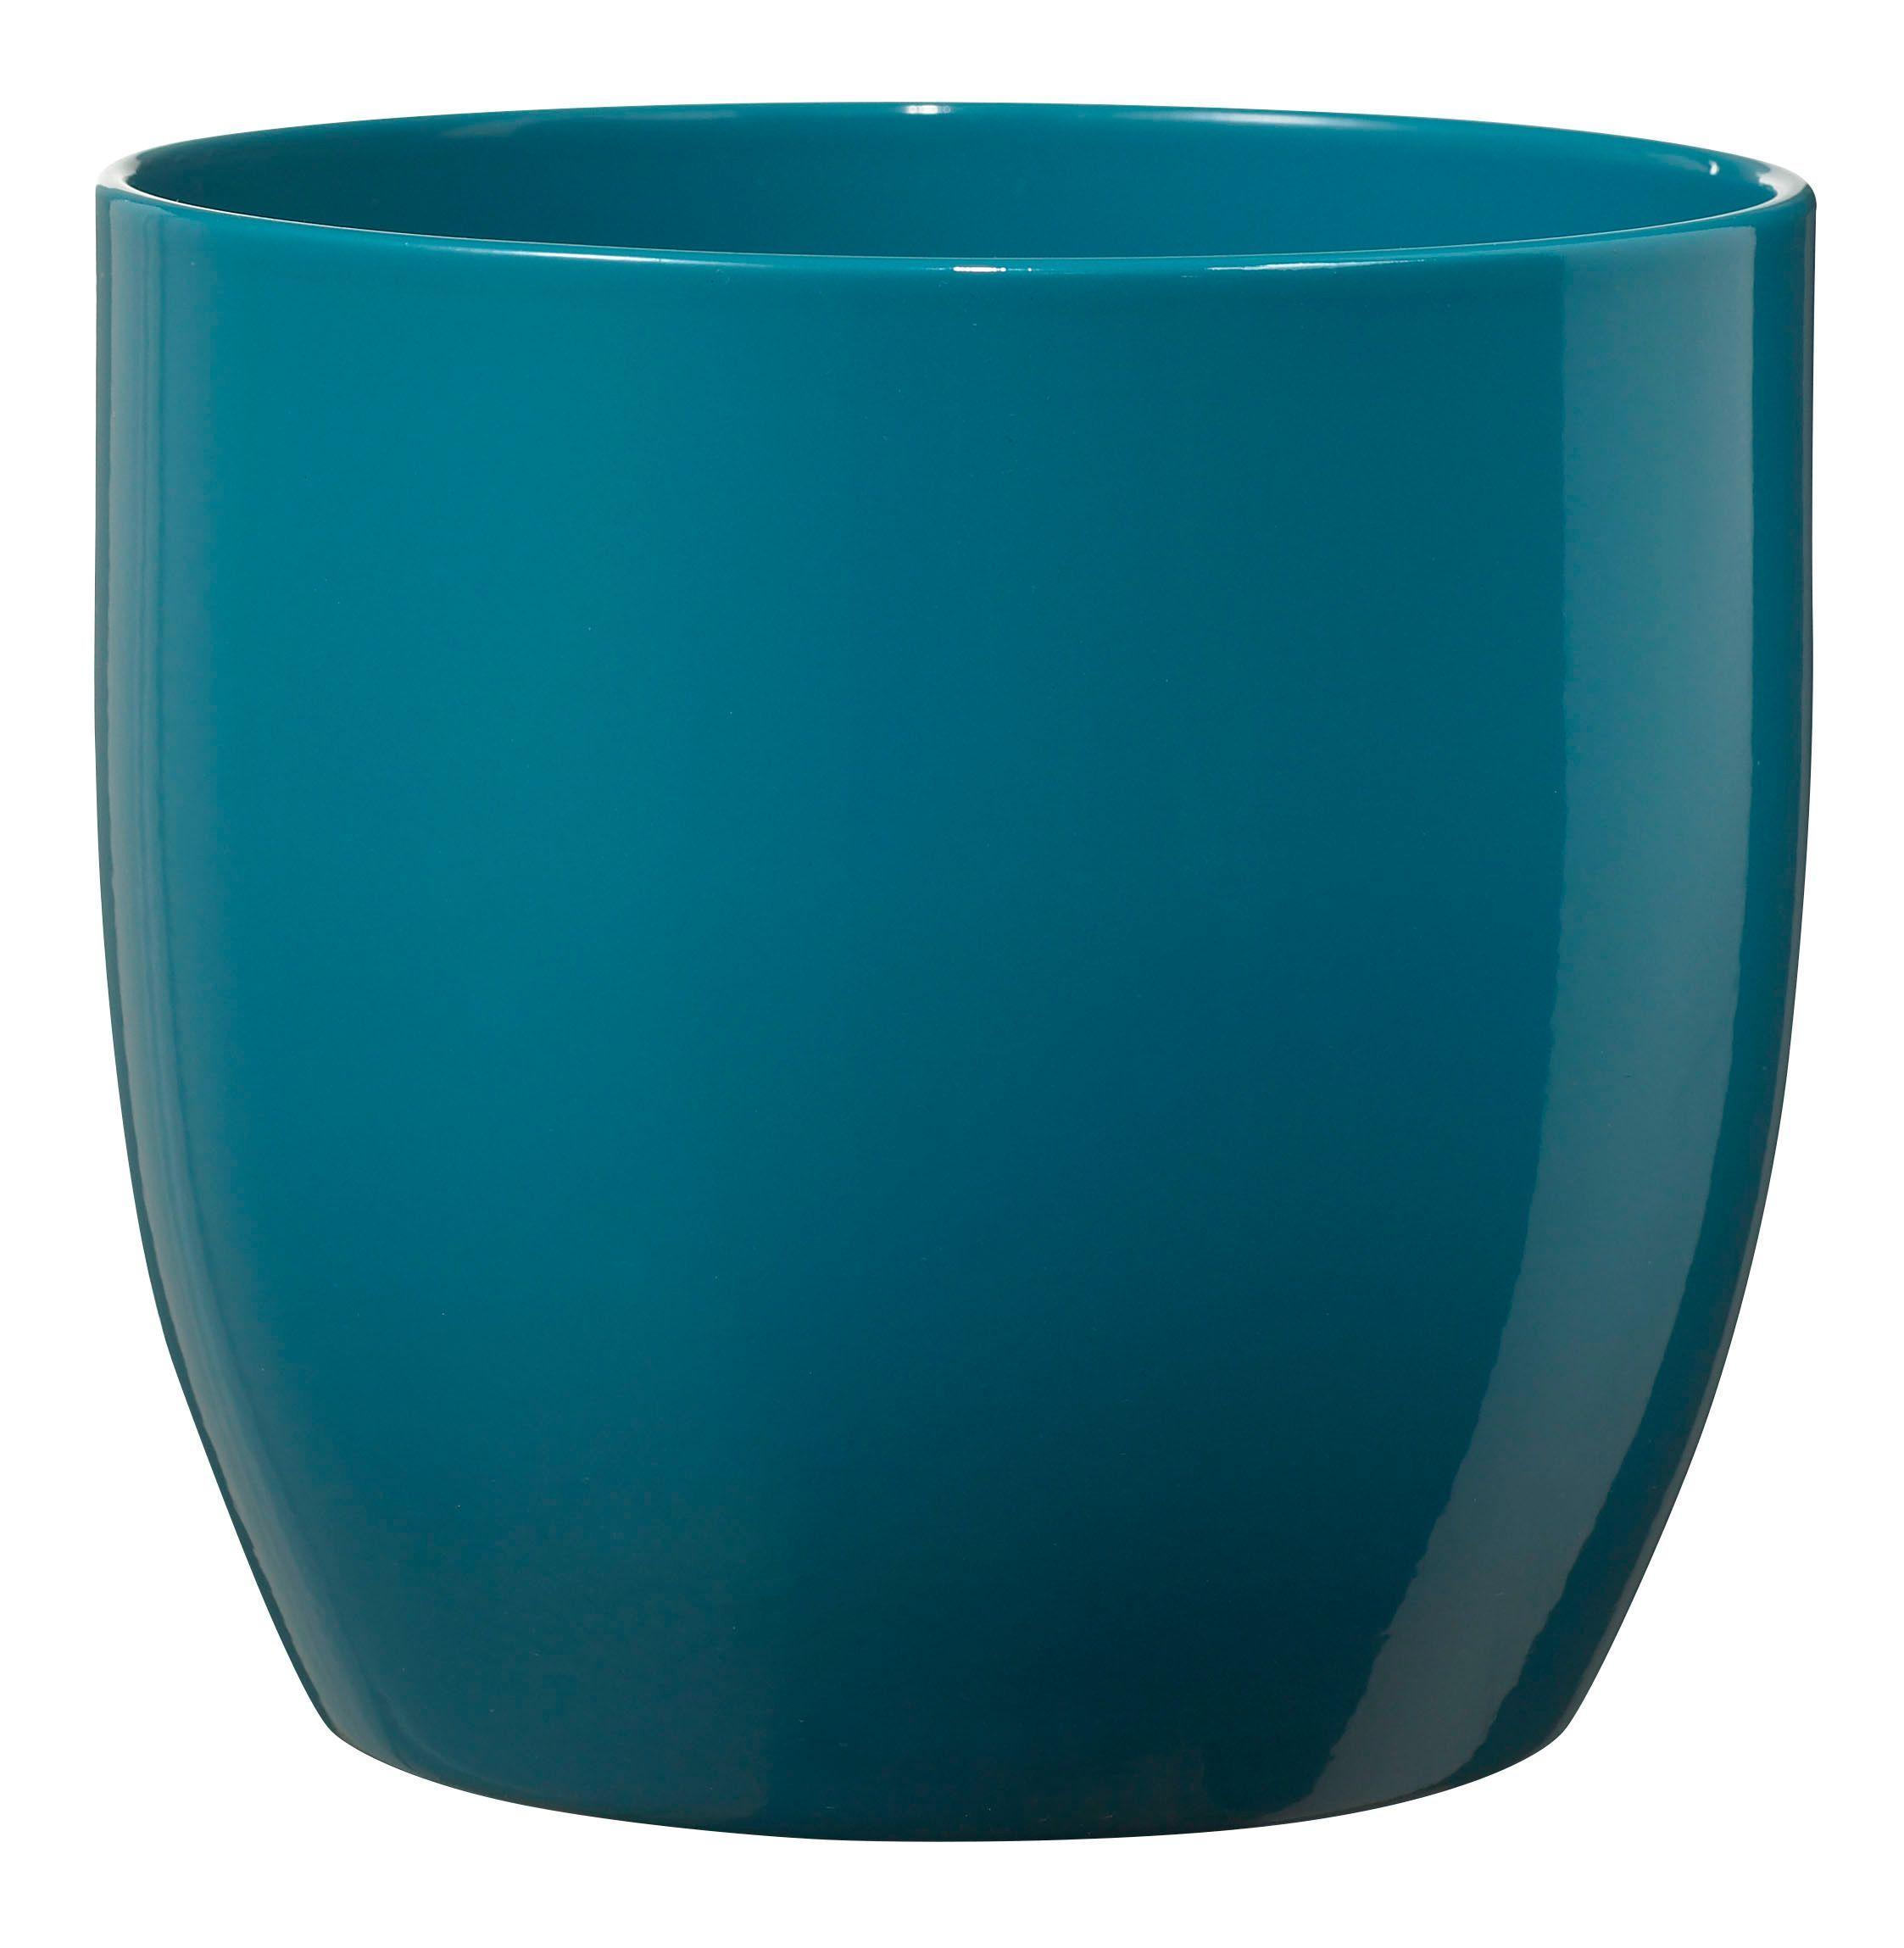 Basel Fashion Round Ceramic Blue Plant Pot H260mm Dia270mm